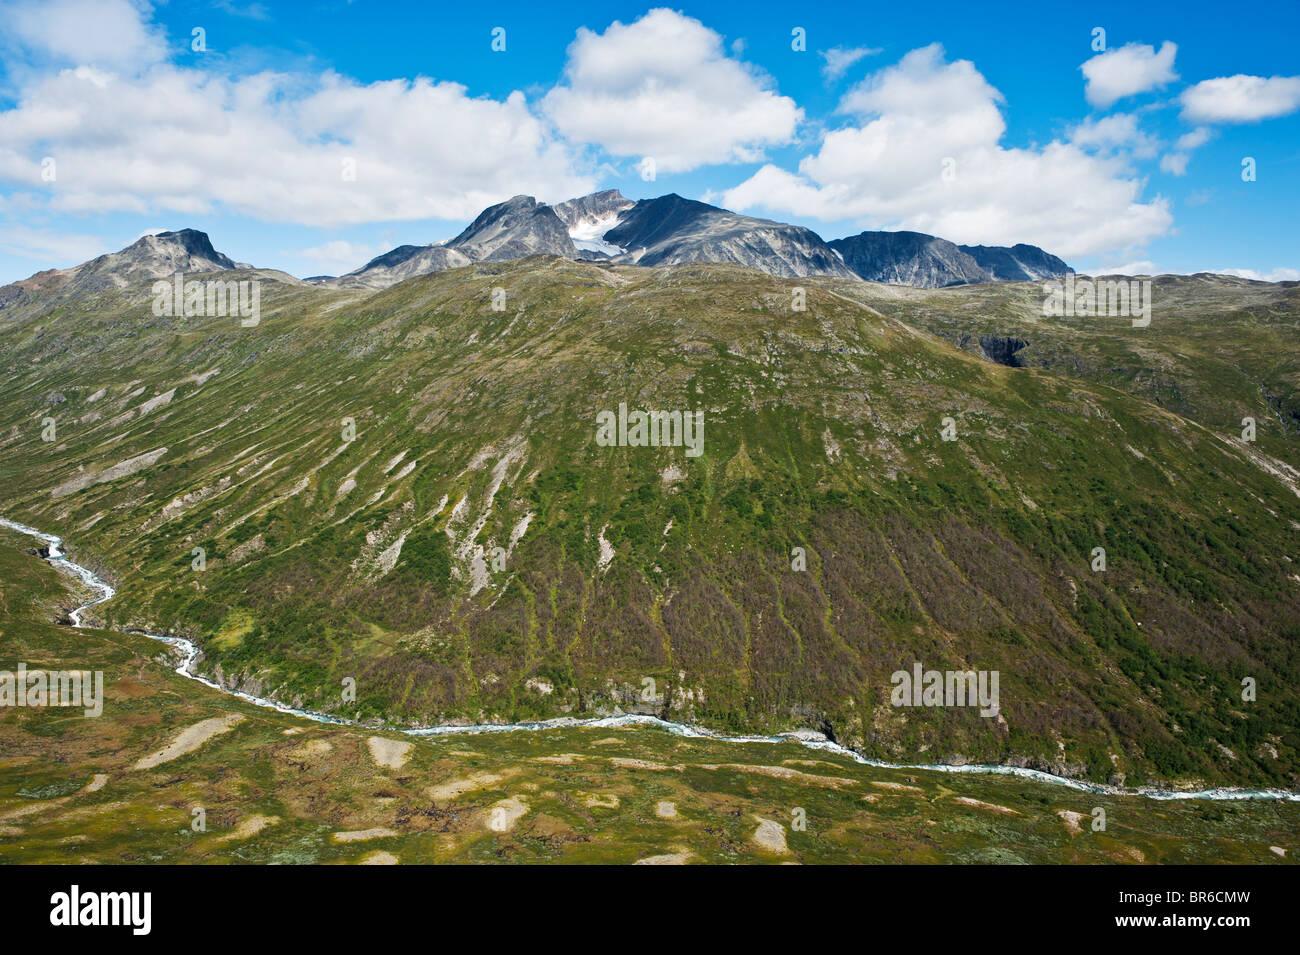 Surtningssue mountain peak rises above Memurudalen river valley, Jotunheimen national park, Norway - Stock Image